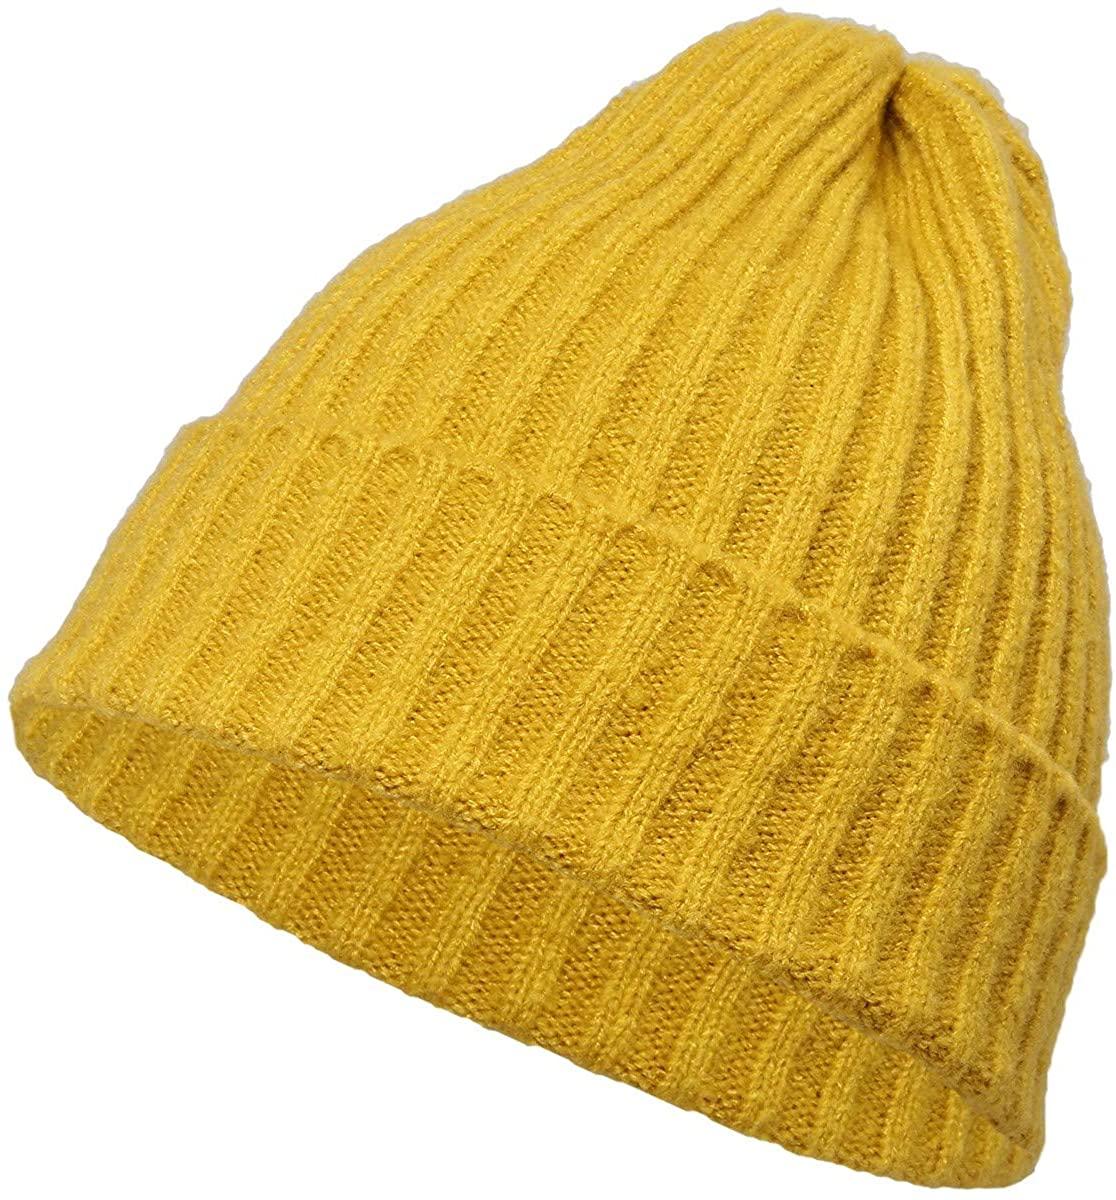 Samtree Beanie Knit Hat Warm Winter Daily Slouchy Skull Beanies Cap for Women Kids